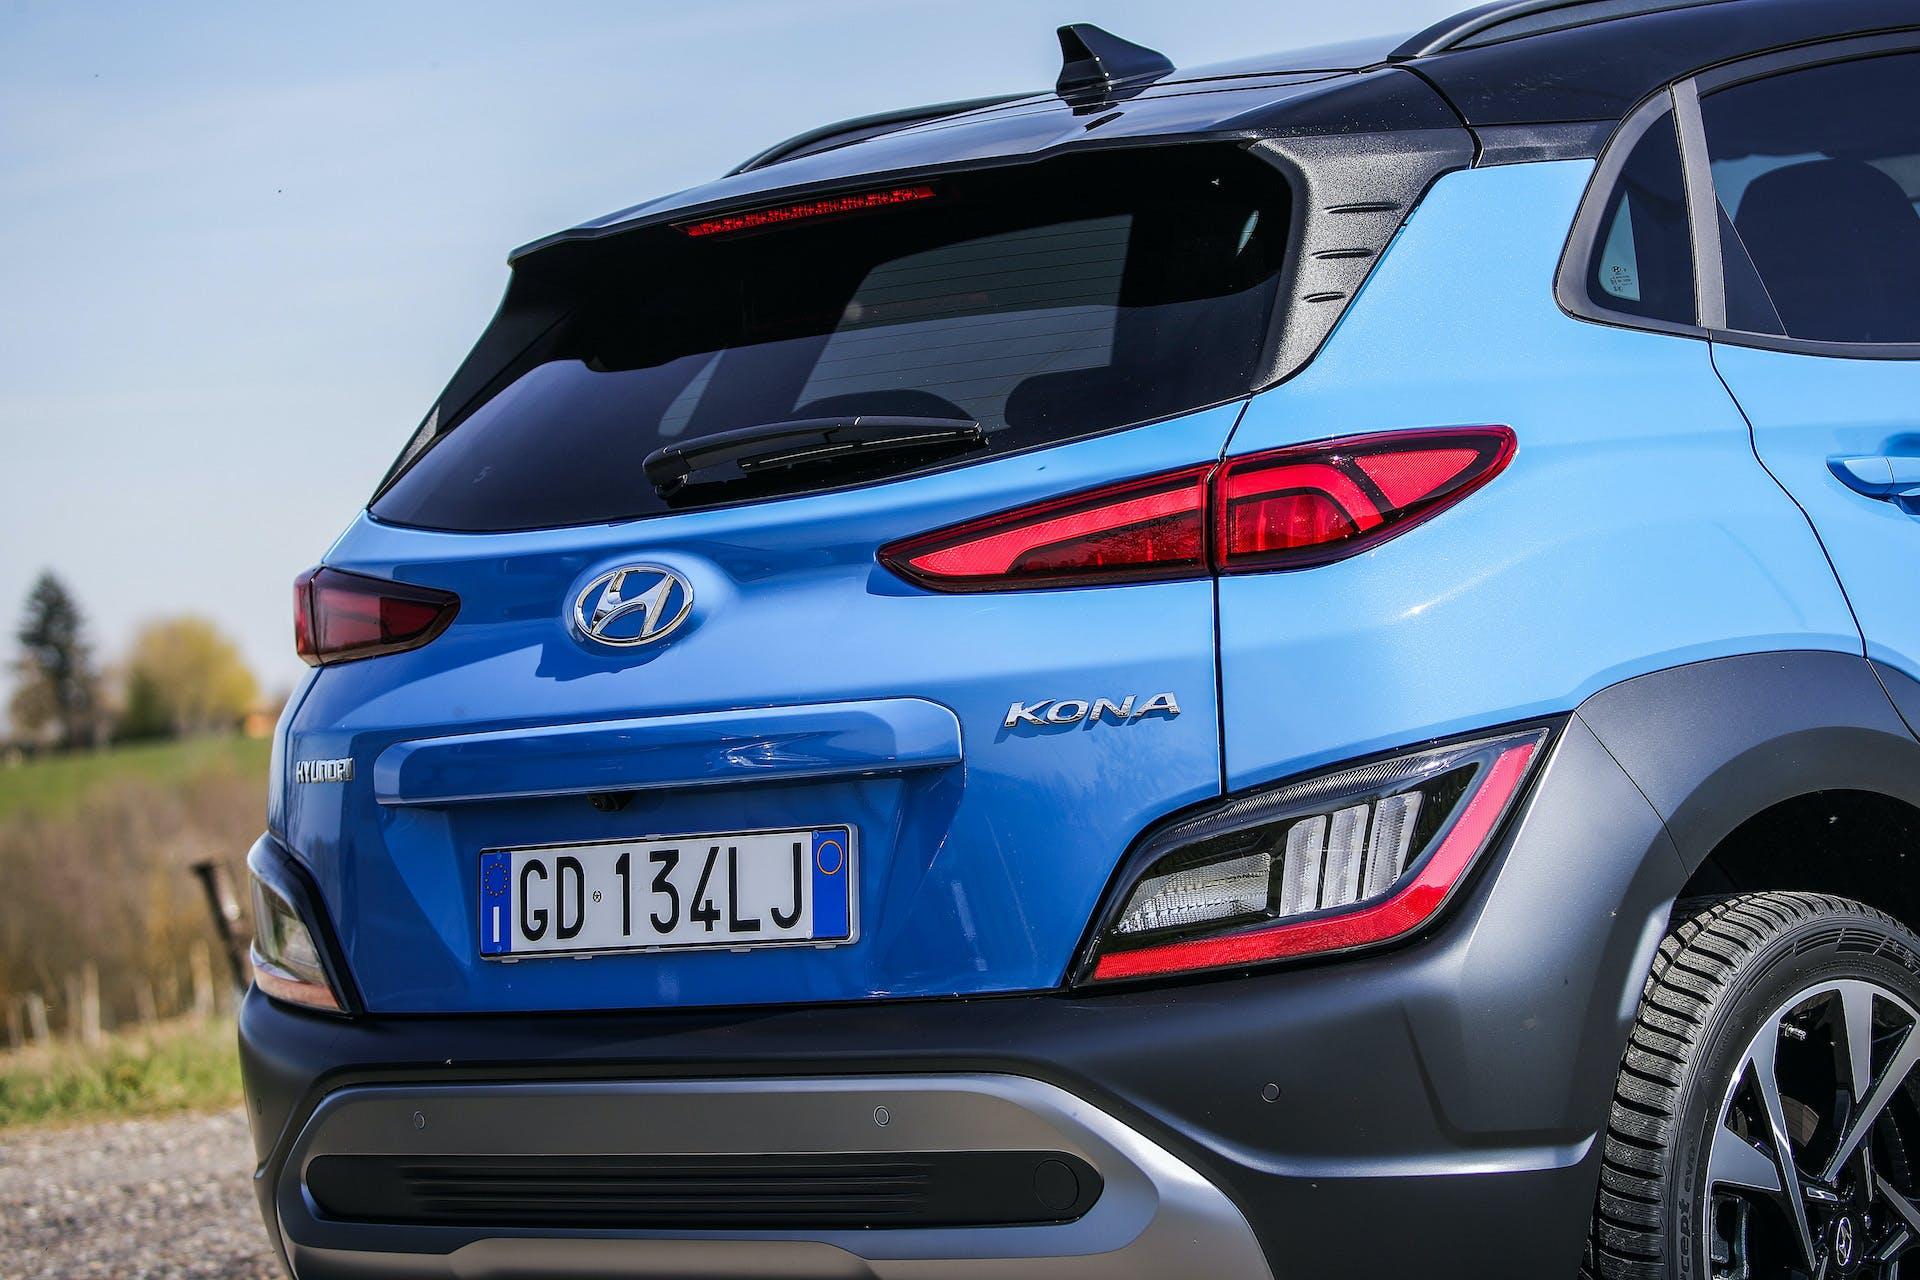 Hyundai KONA restyling test